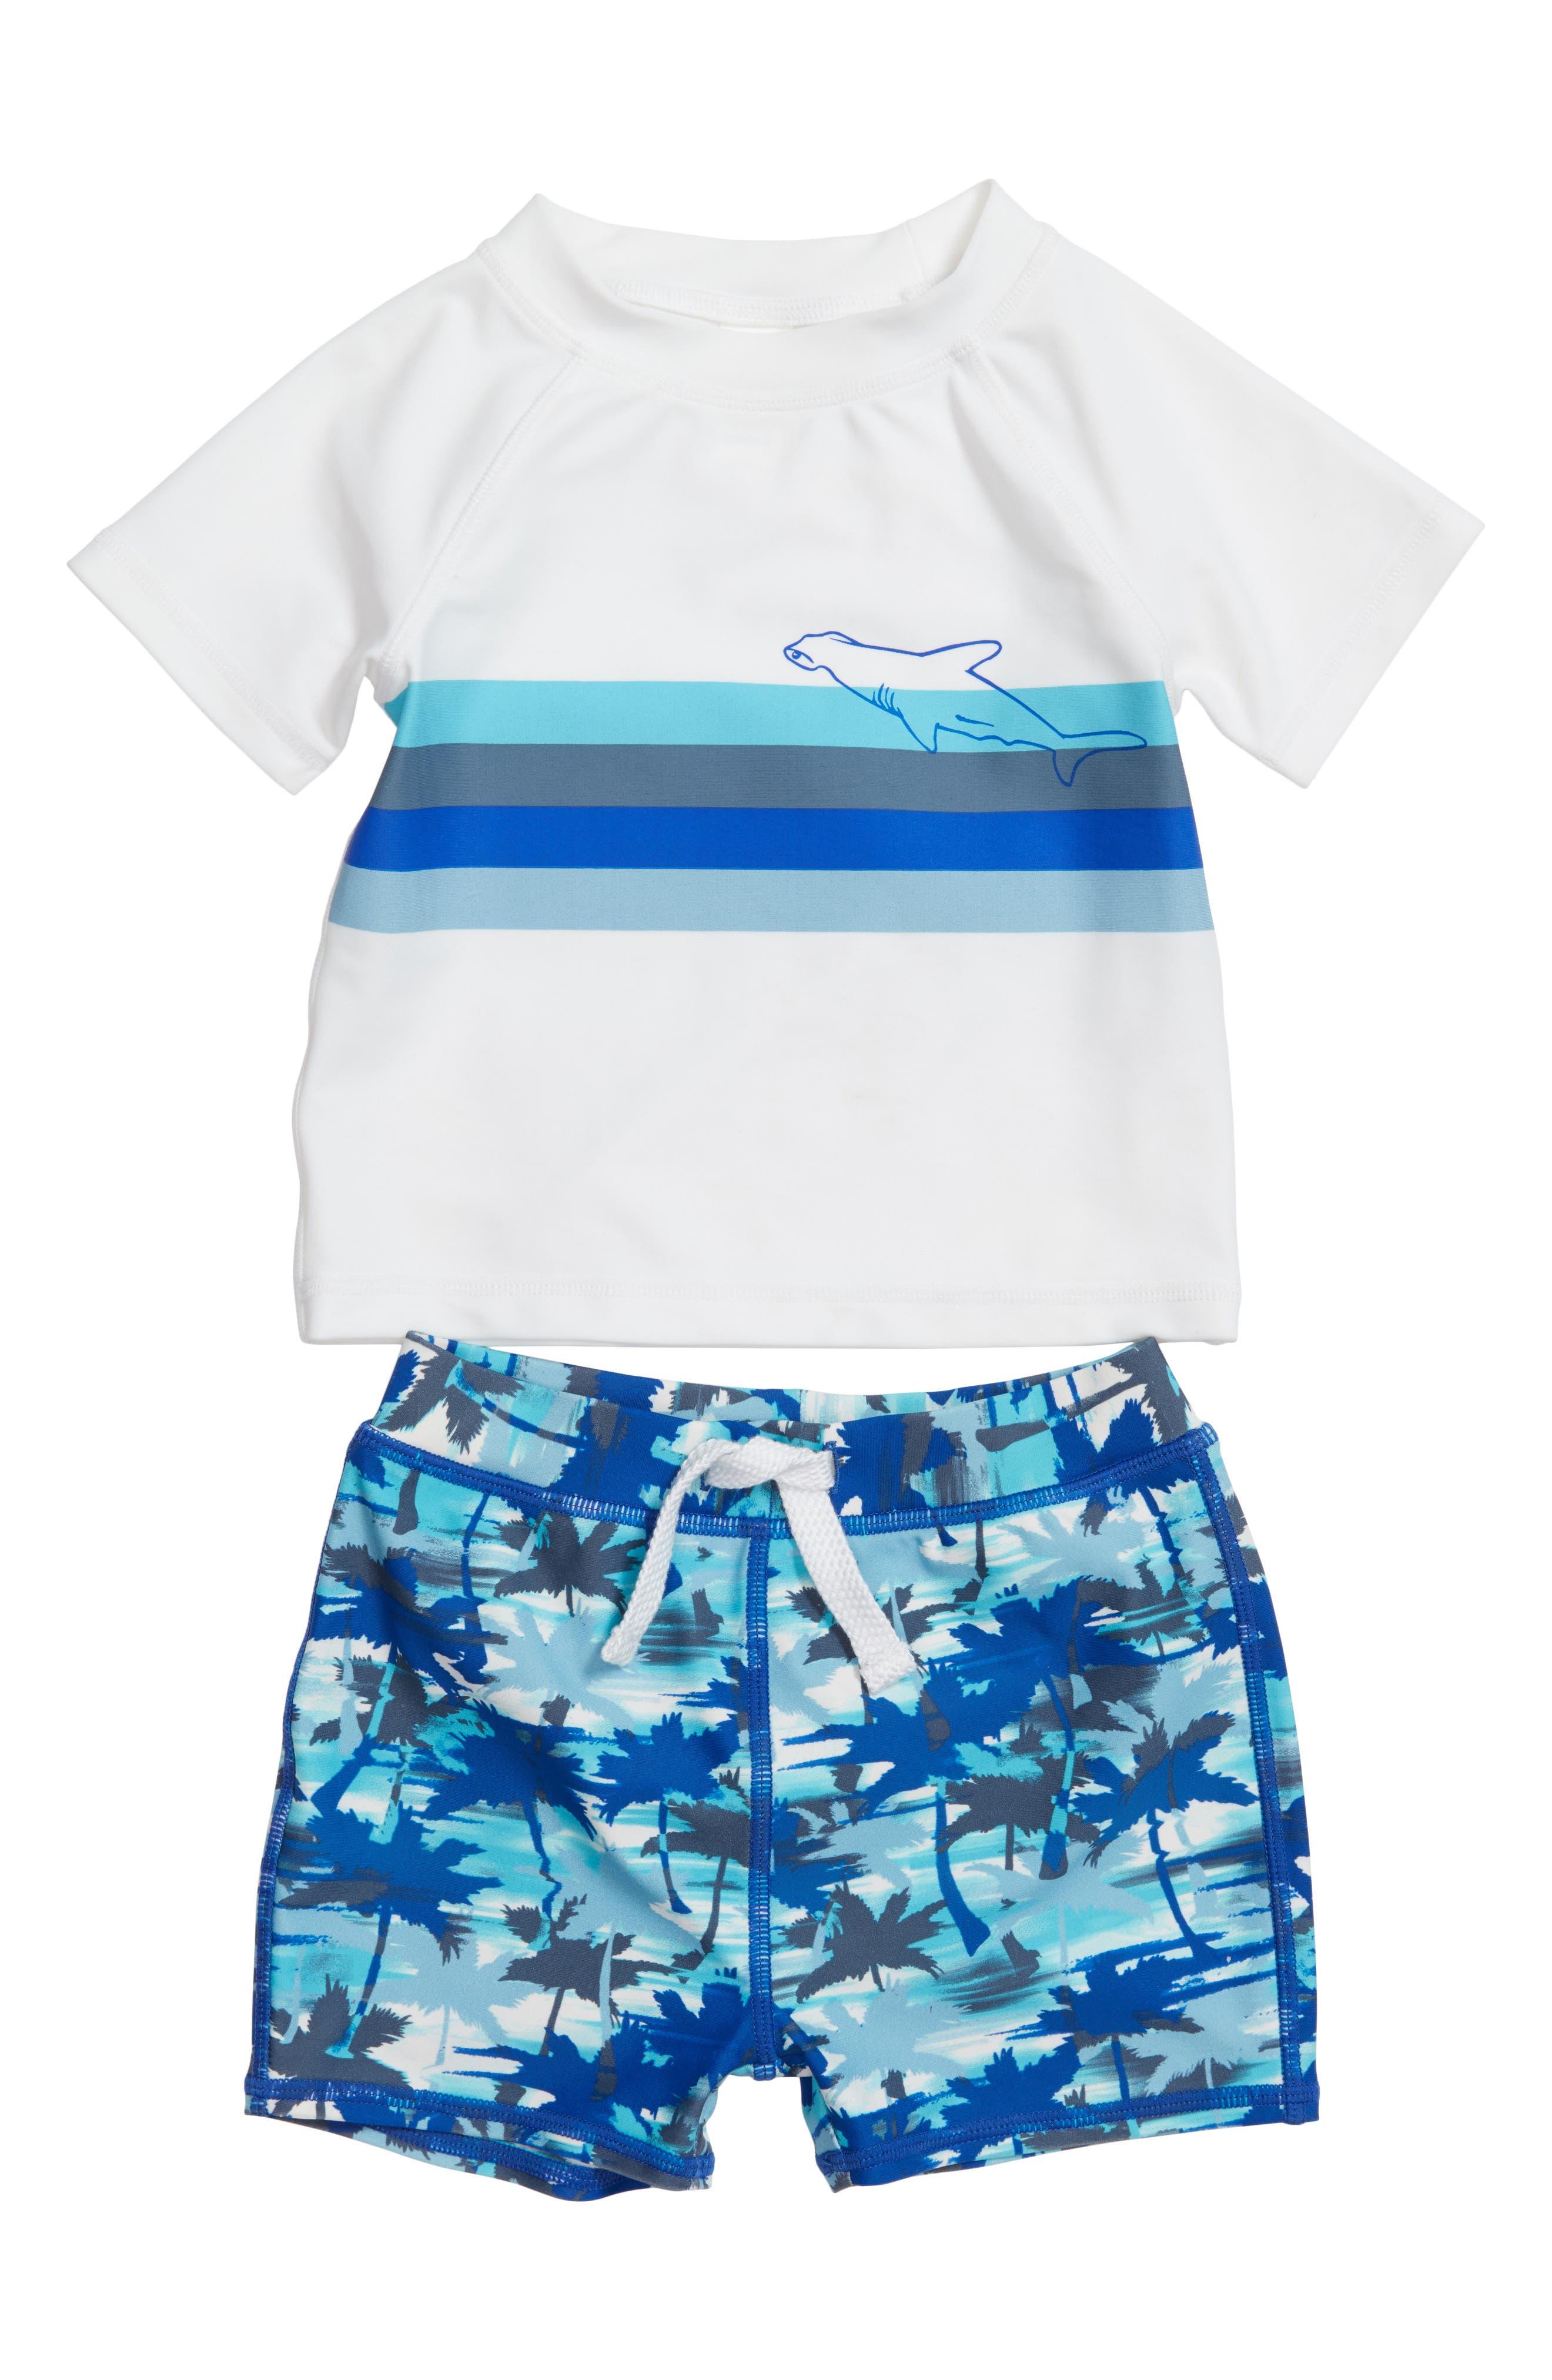 Two-Piece Rashguard Swimsuit,                         Main,                         color, 101